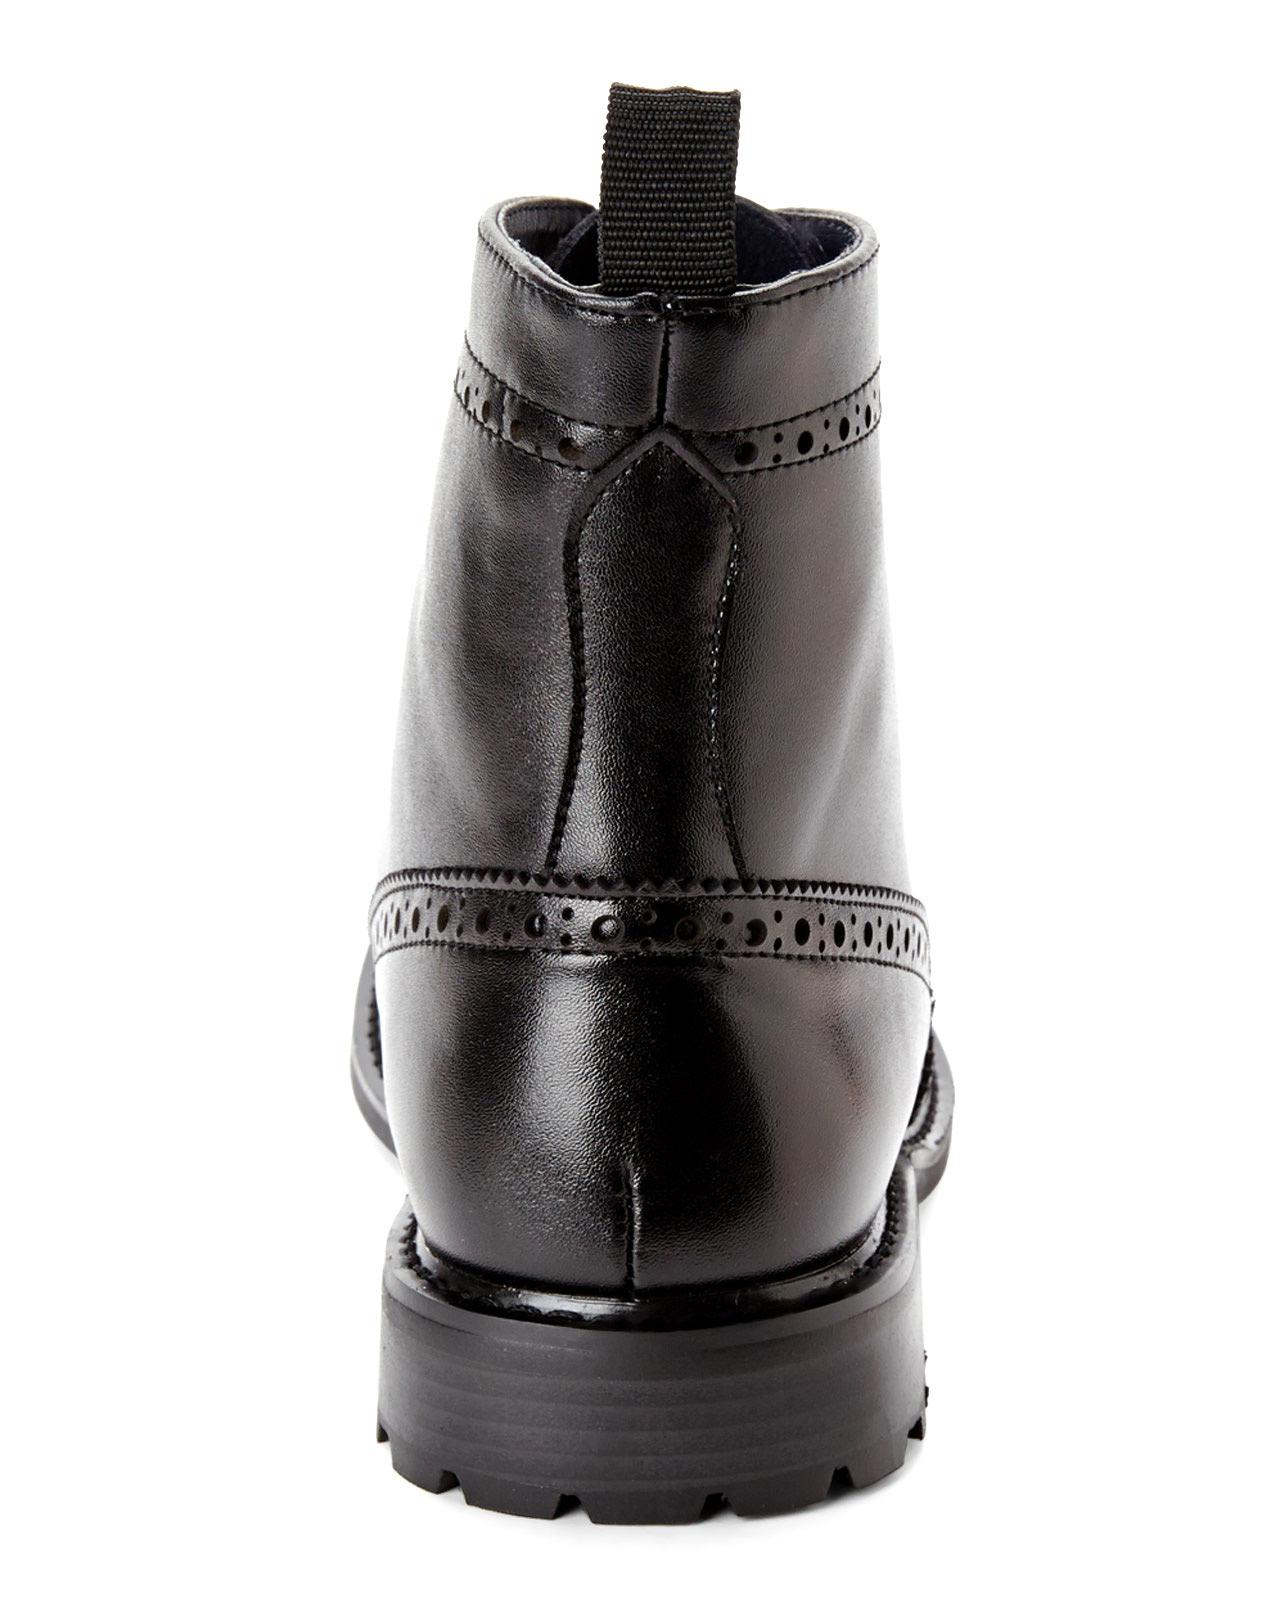 newest d9225 03b86 joseph-abboud-black-black-philip-wingtip-boots-product-1 -25001456-2-509305183-normal.jpeg